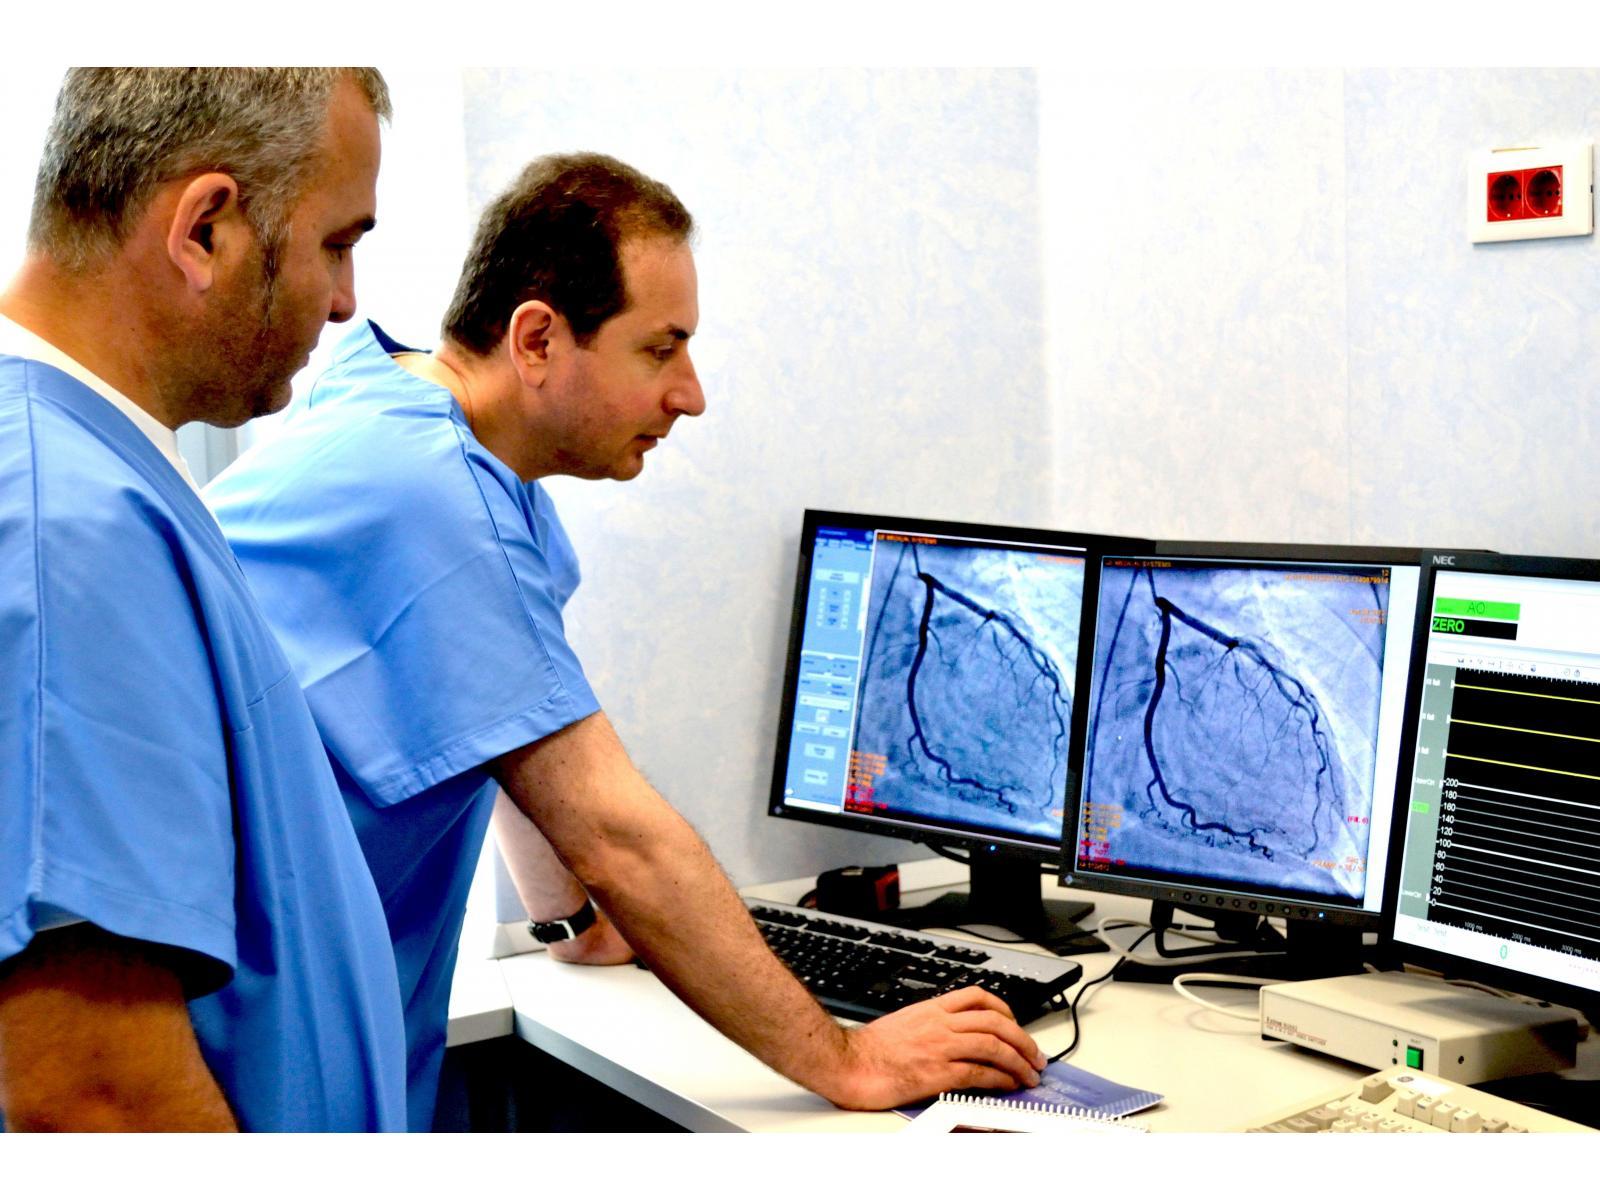 Spitalul Monza - examen_cardiointerv.jpg